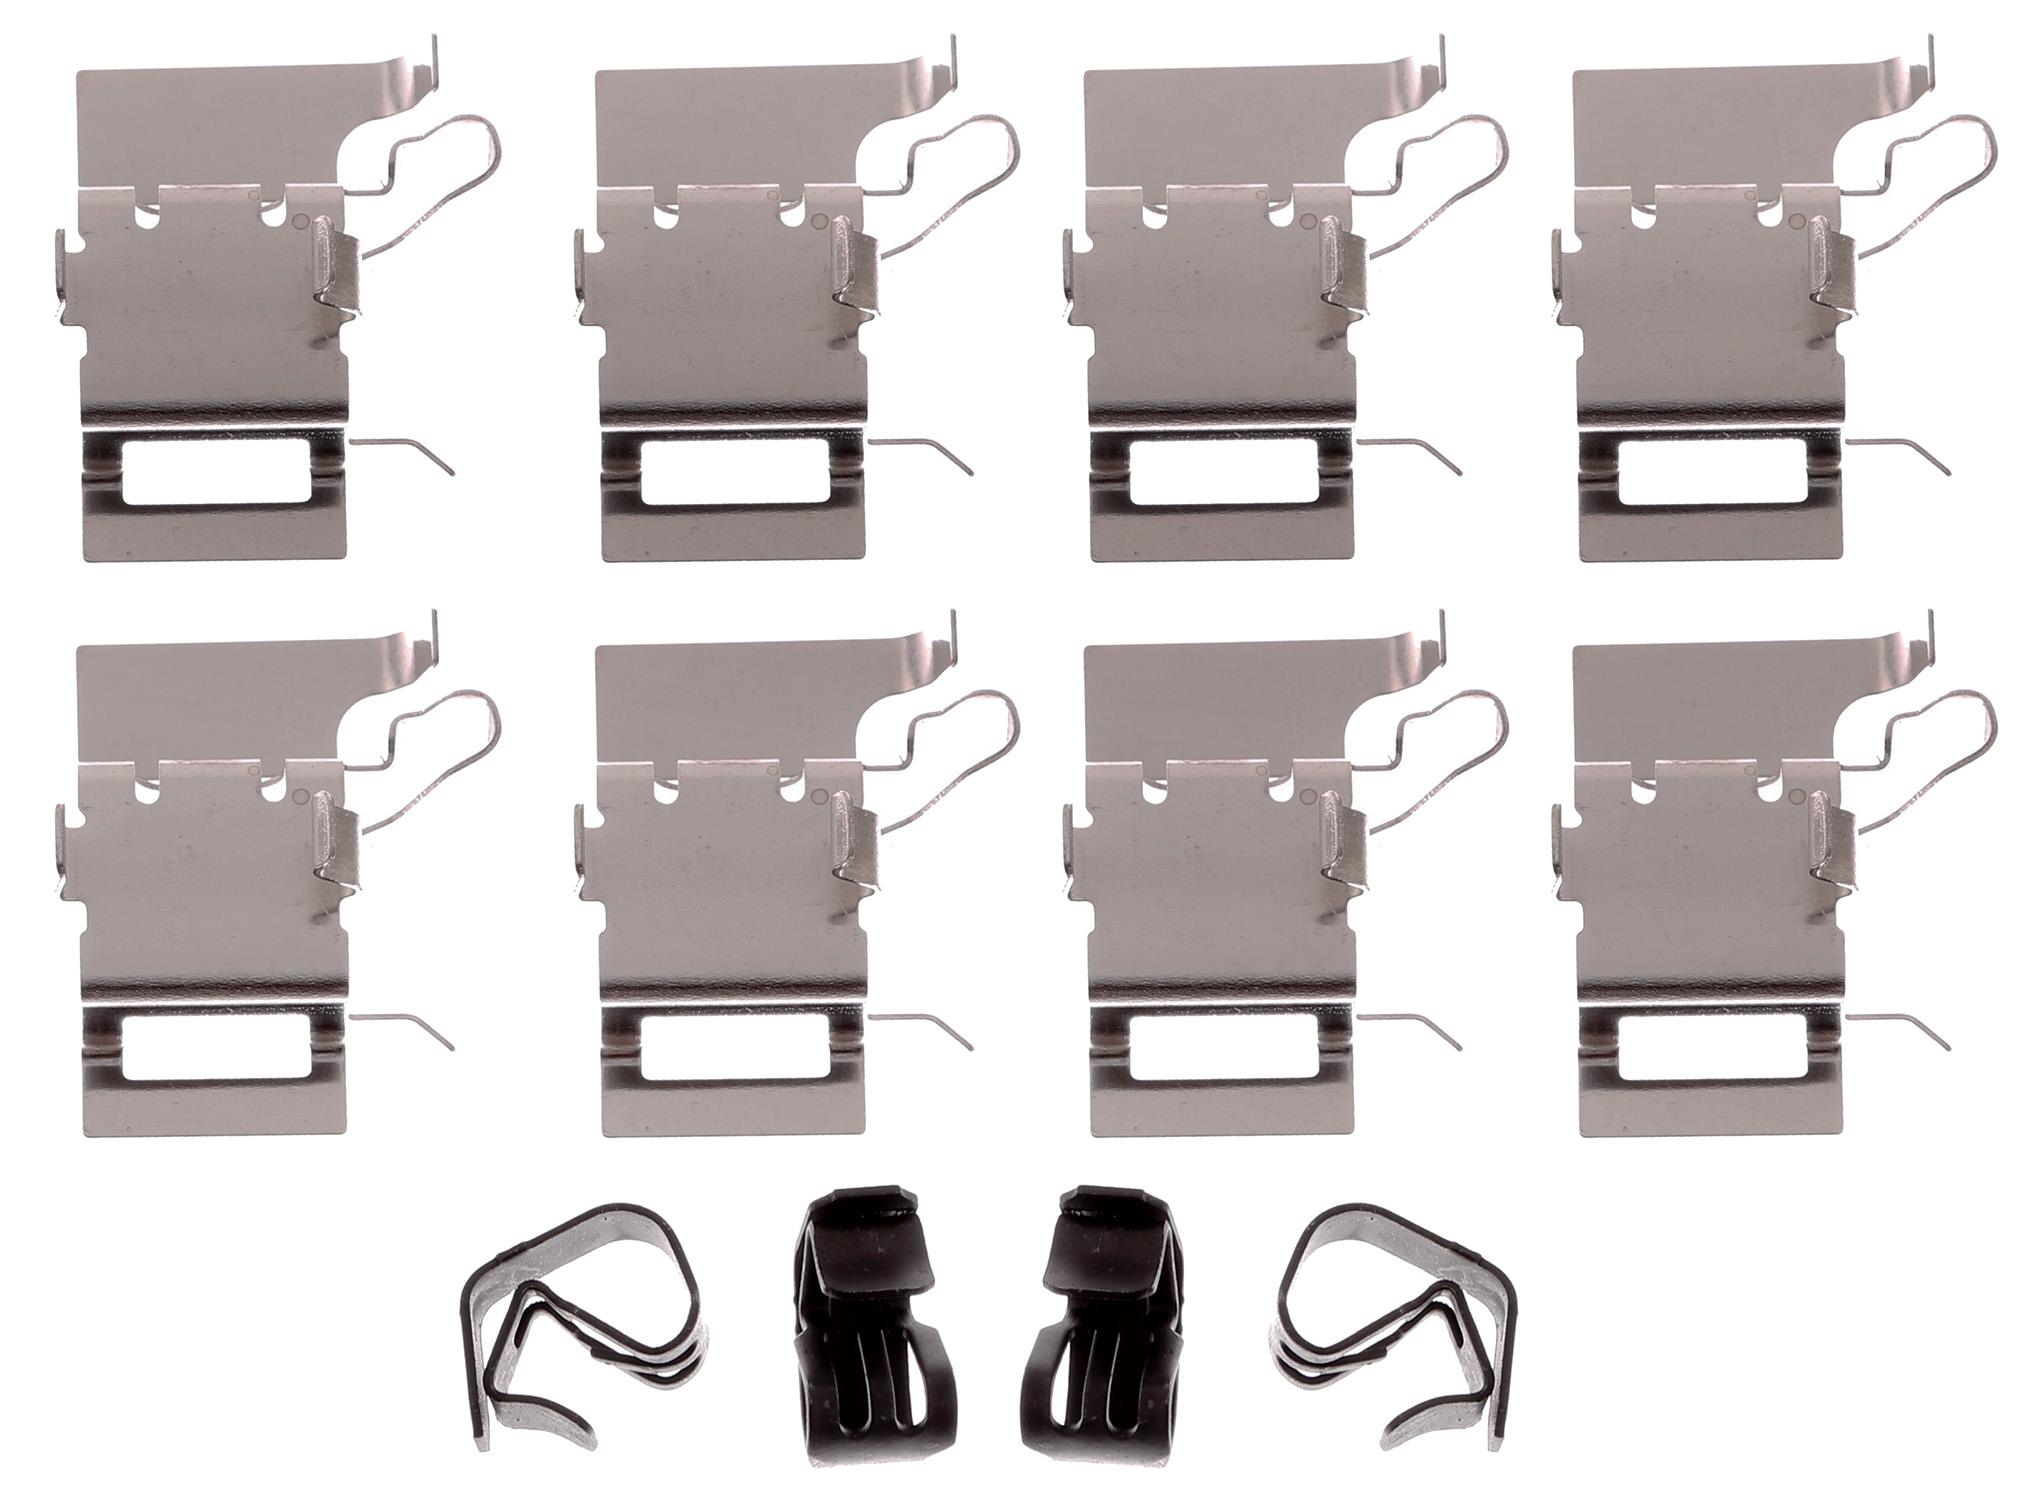 ACDELCO GOLD/PROFESSIONAL BRAKES - Disc Brake Hardware Kit (Front) - ADU 18K2537